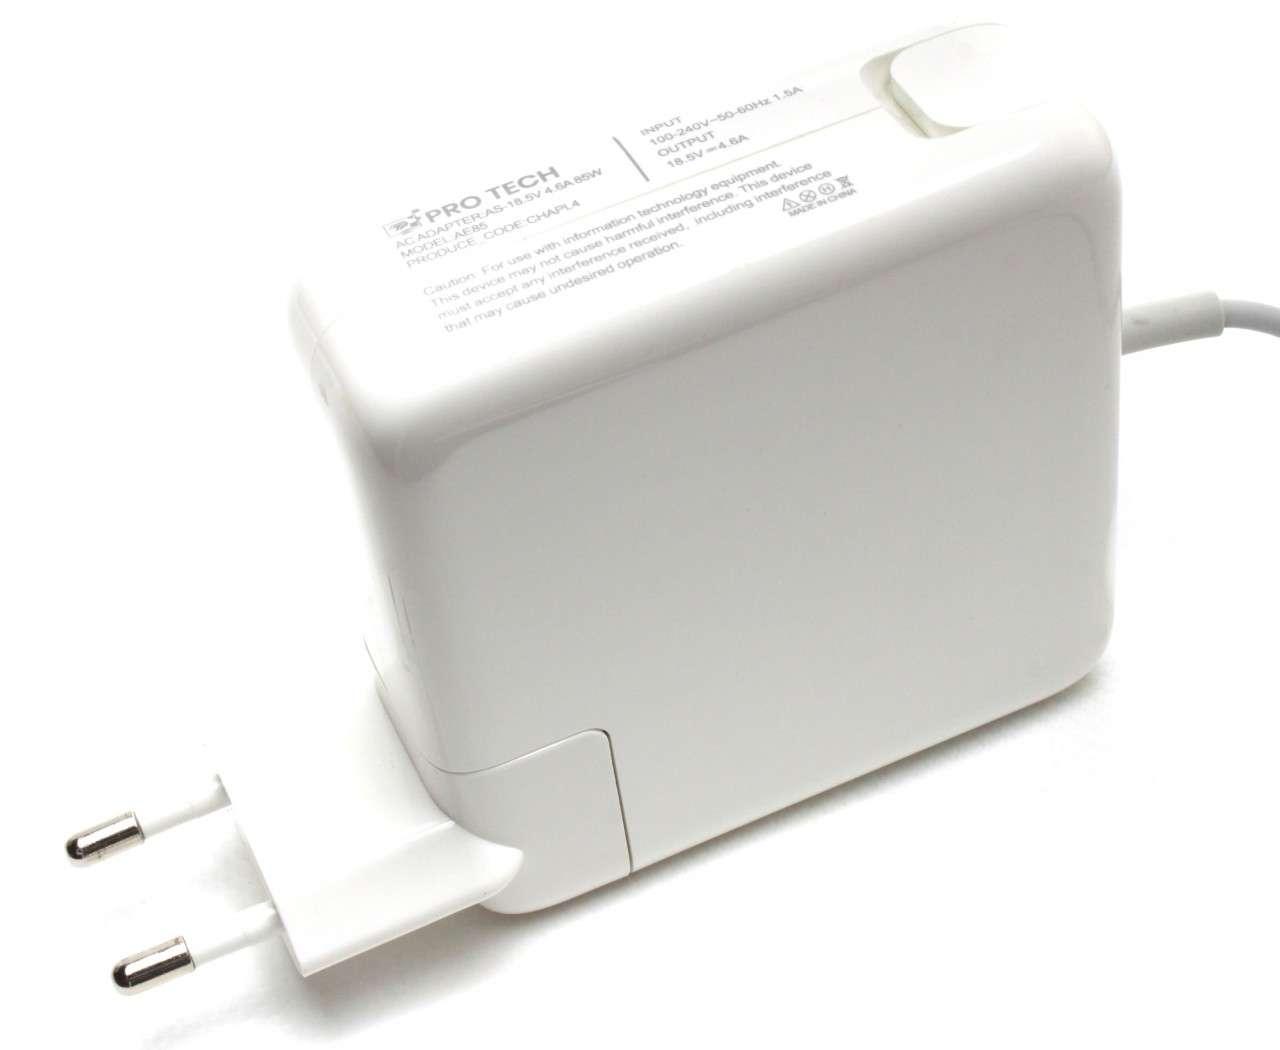 Incarcator Apple MacBook Pro 17 inch Mid 2010 85W Replacement imagine